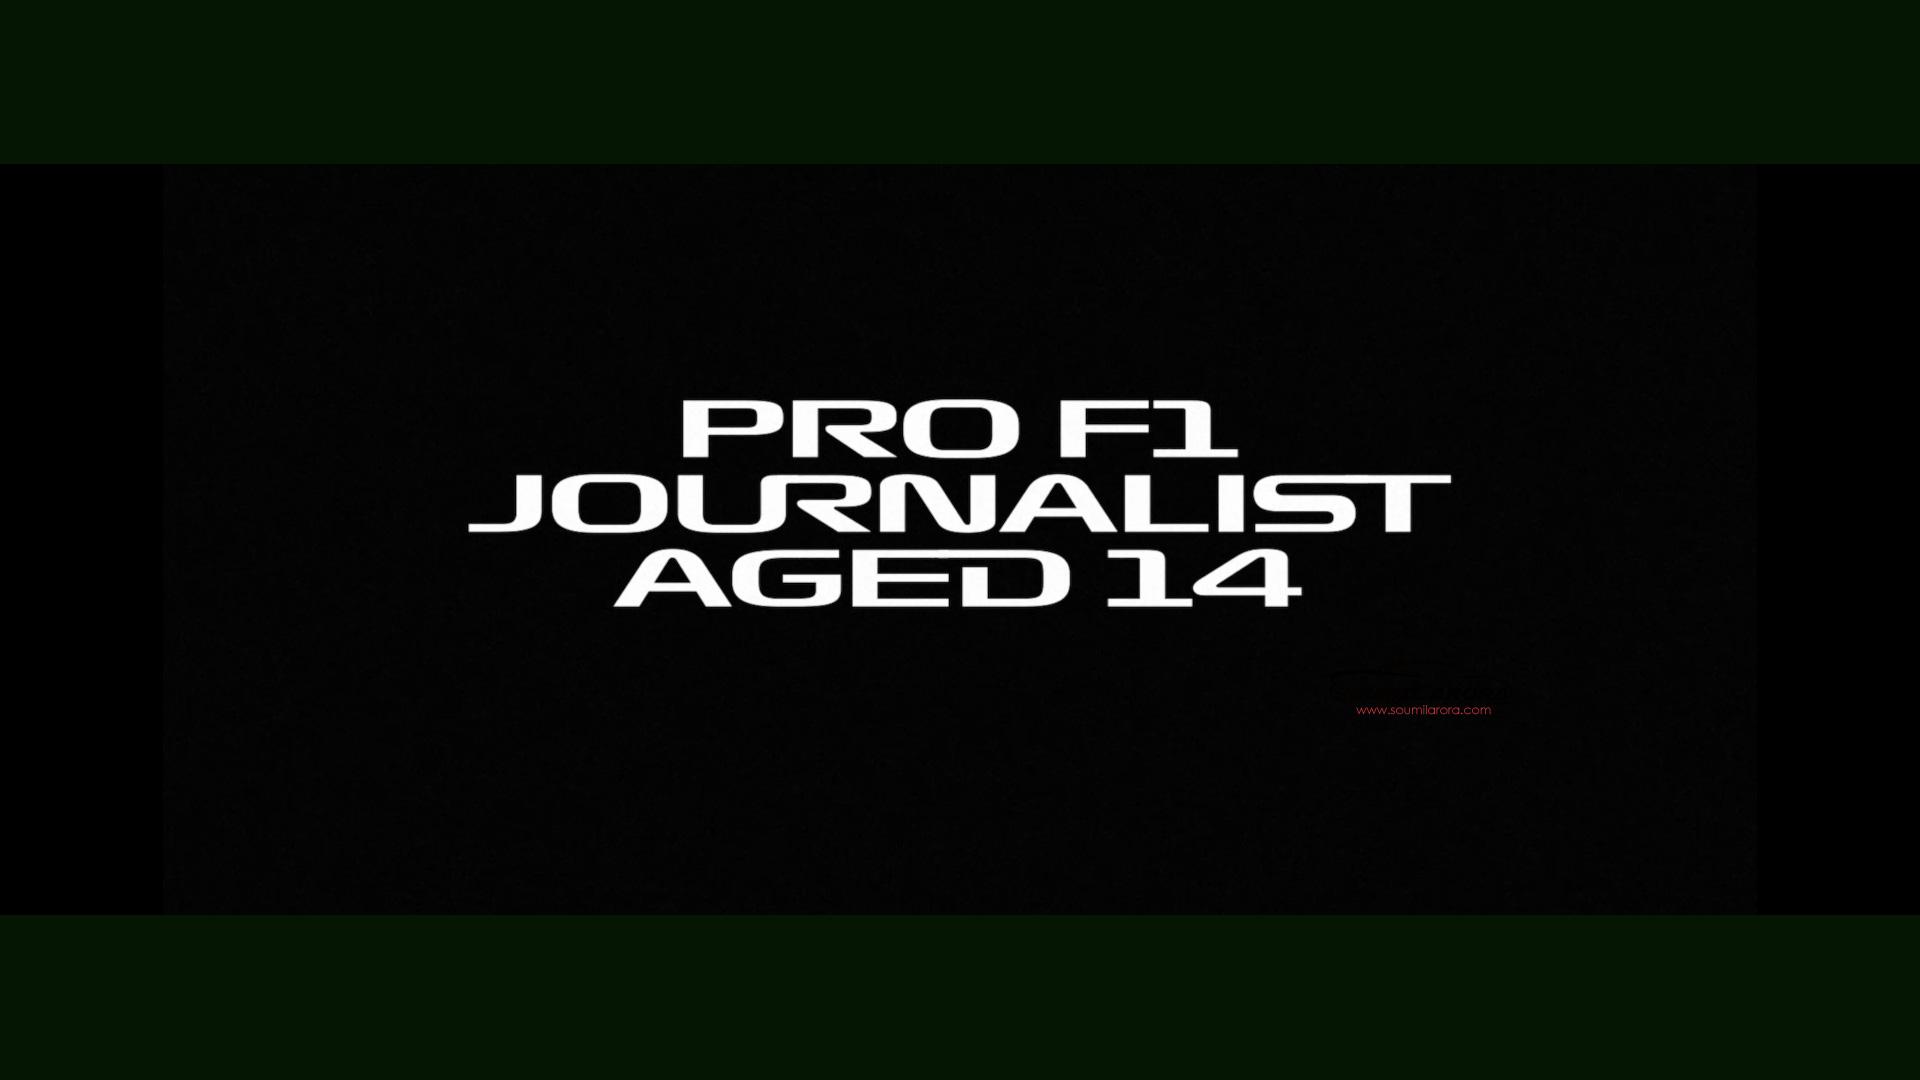 Formula 1 Engineered Insanity F1 Super Fan Soumil Arora Aged 14 Pro F1 Journalist